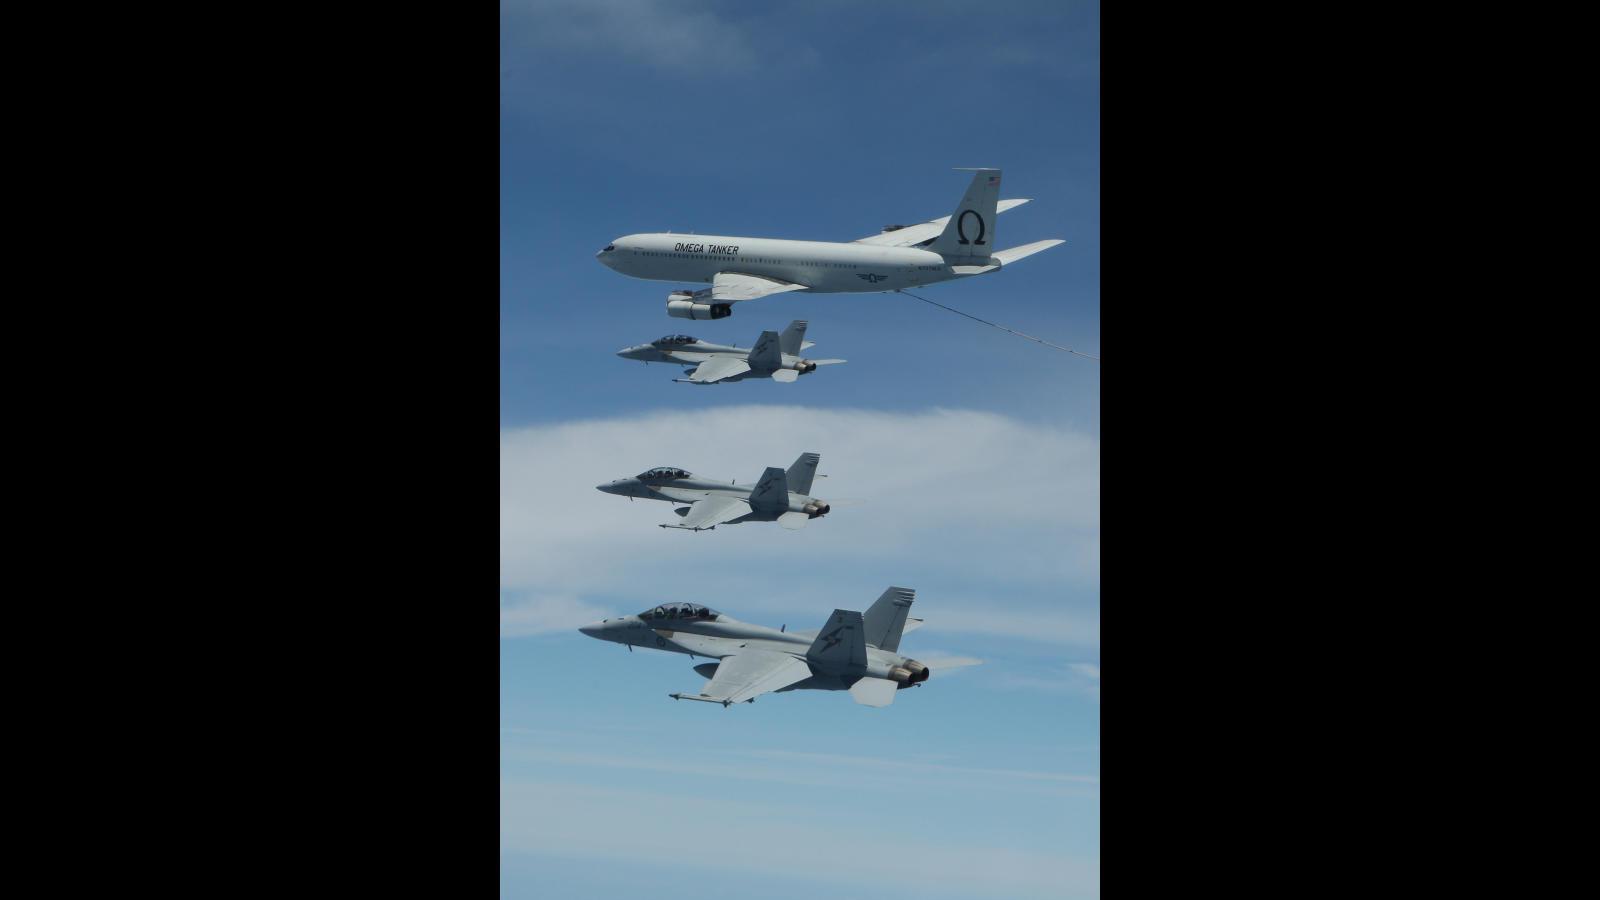 Bersama Shield; Exercise; Royal Australian Air Force; Public Affairs;